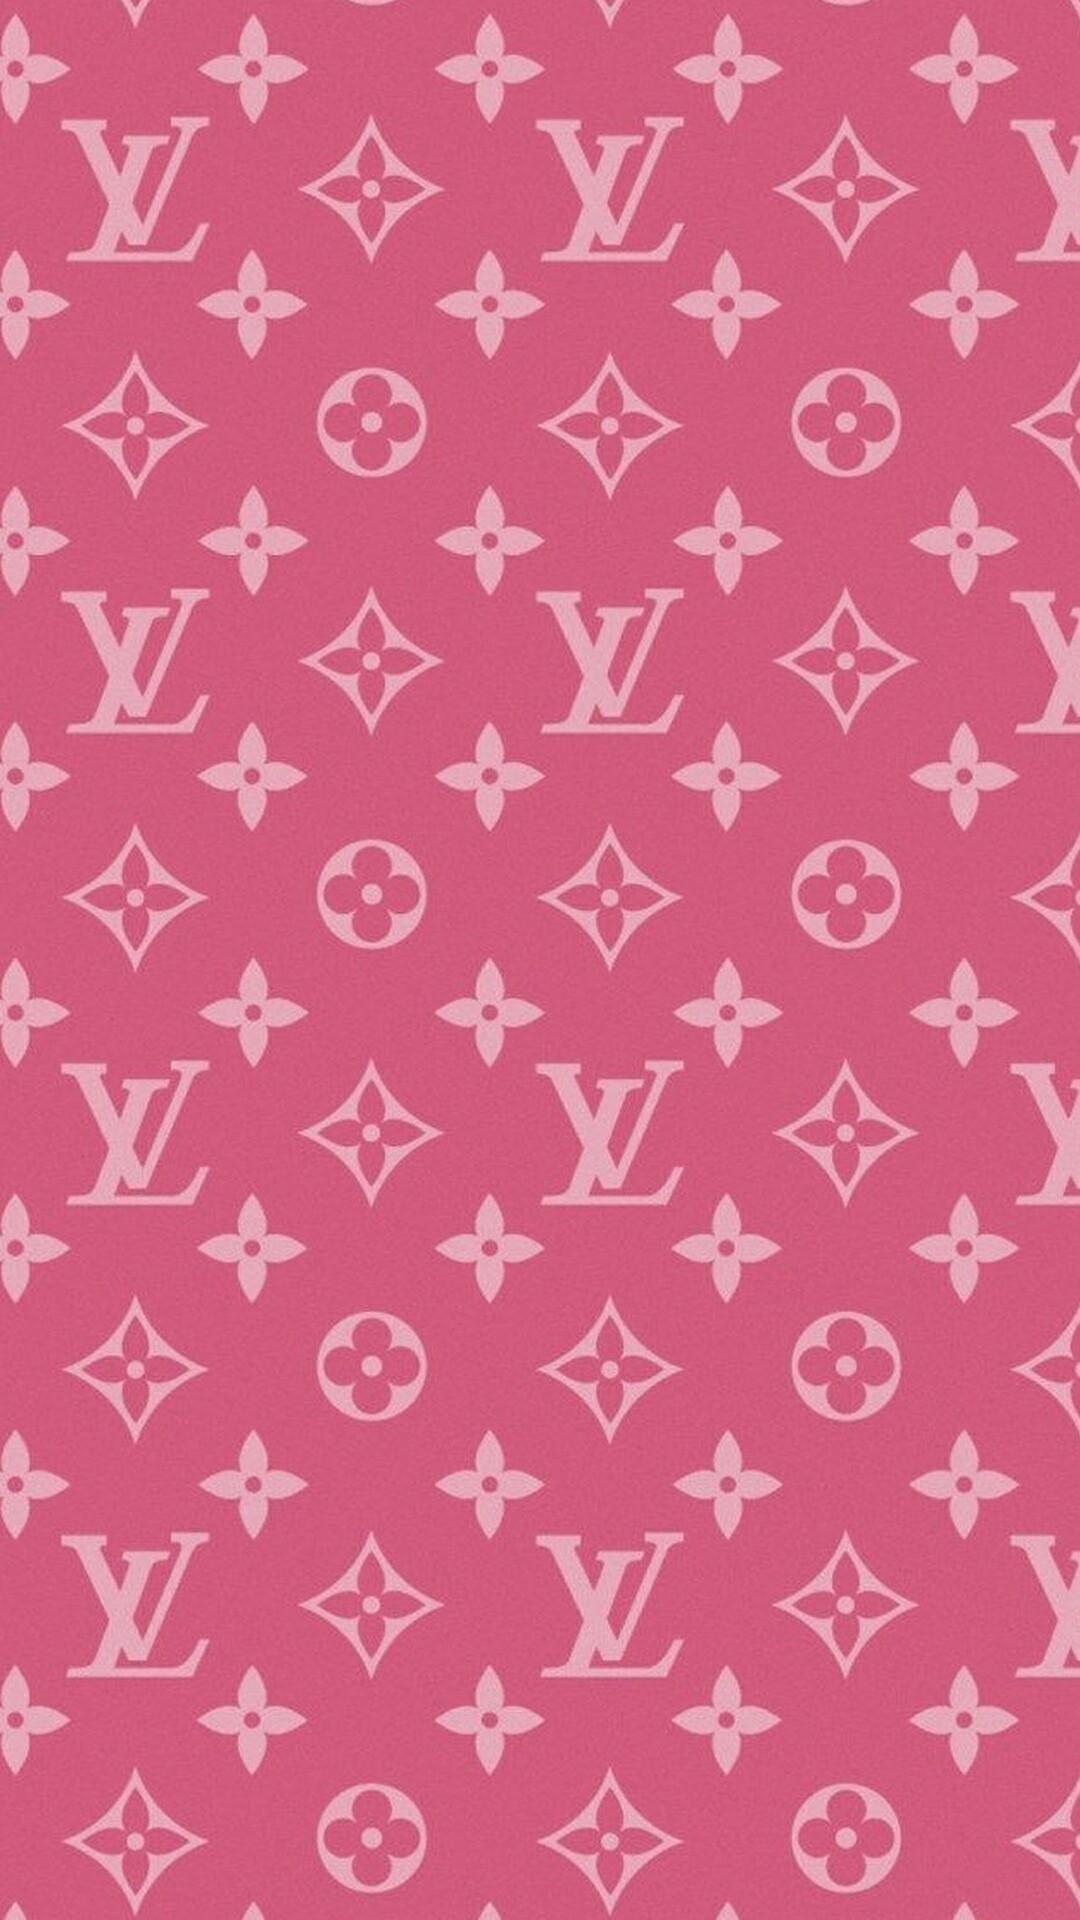 Louis vuitton wallpaper for iphone x